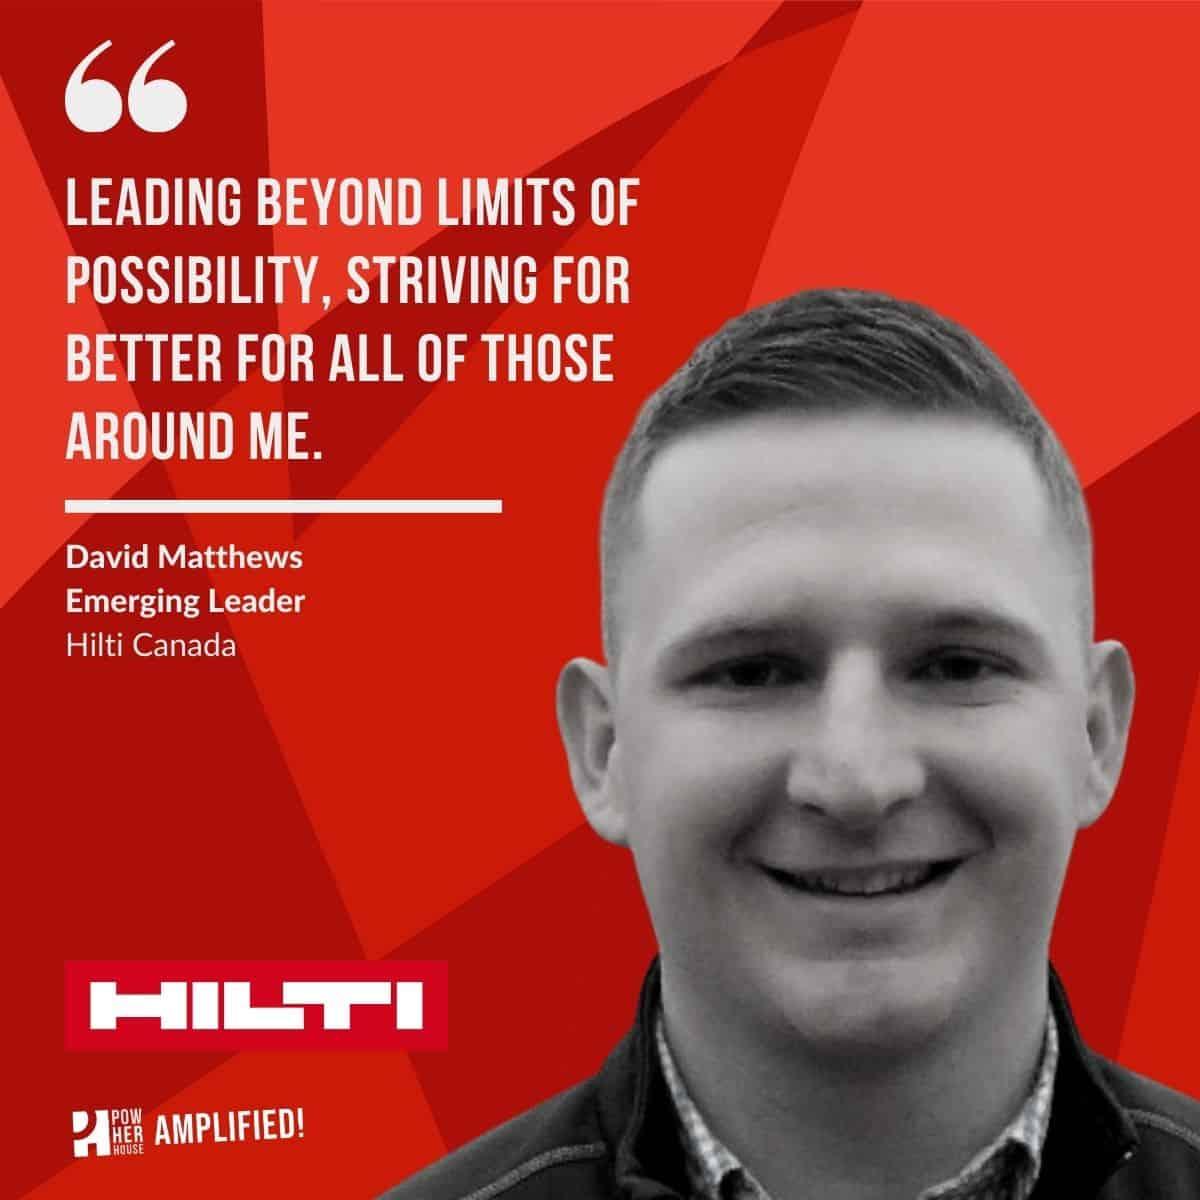 Hilti profile - David Matthews